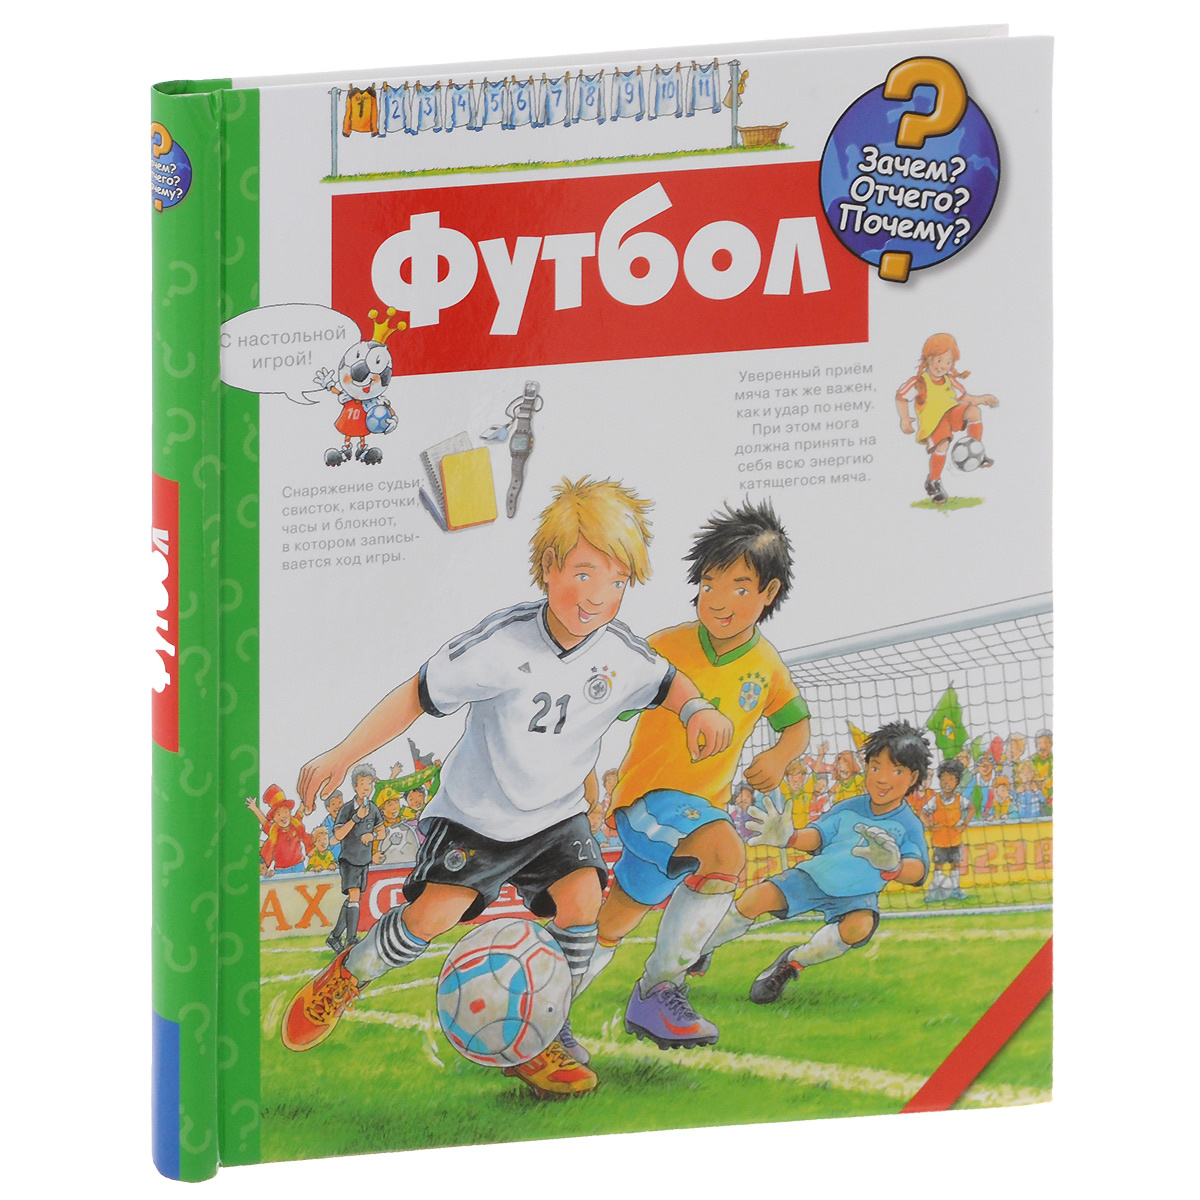 Футбол #1